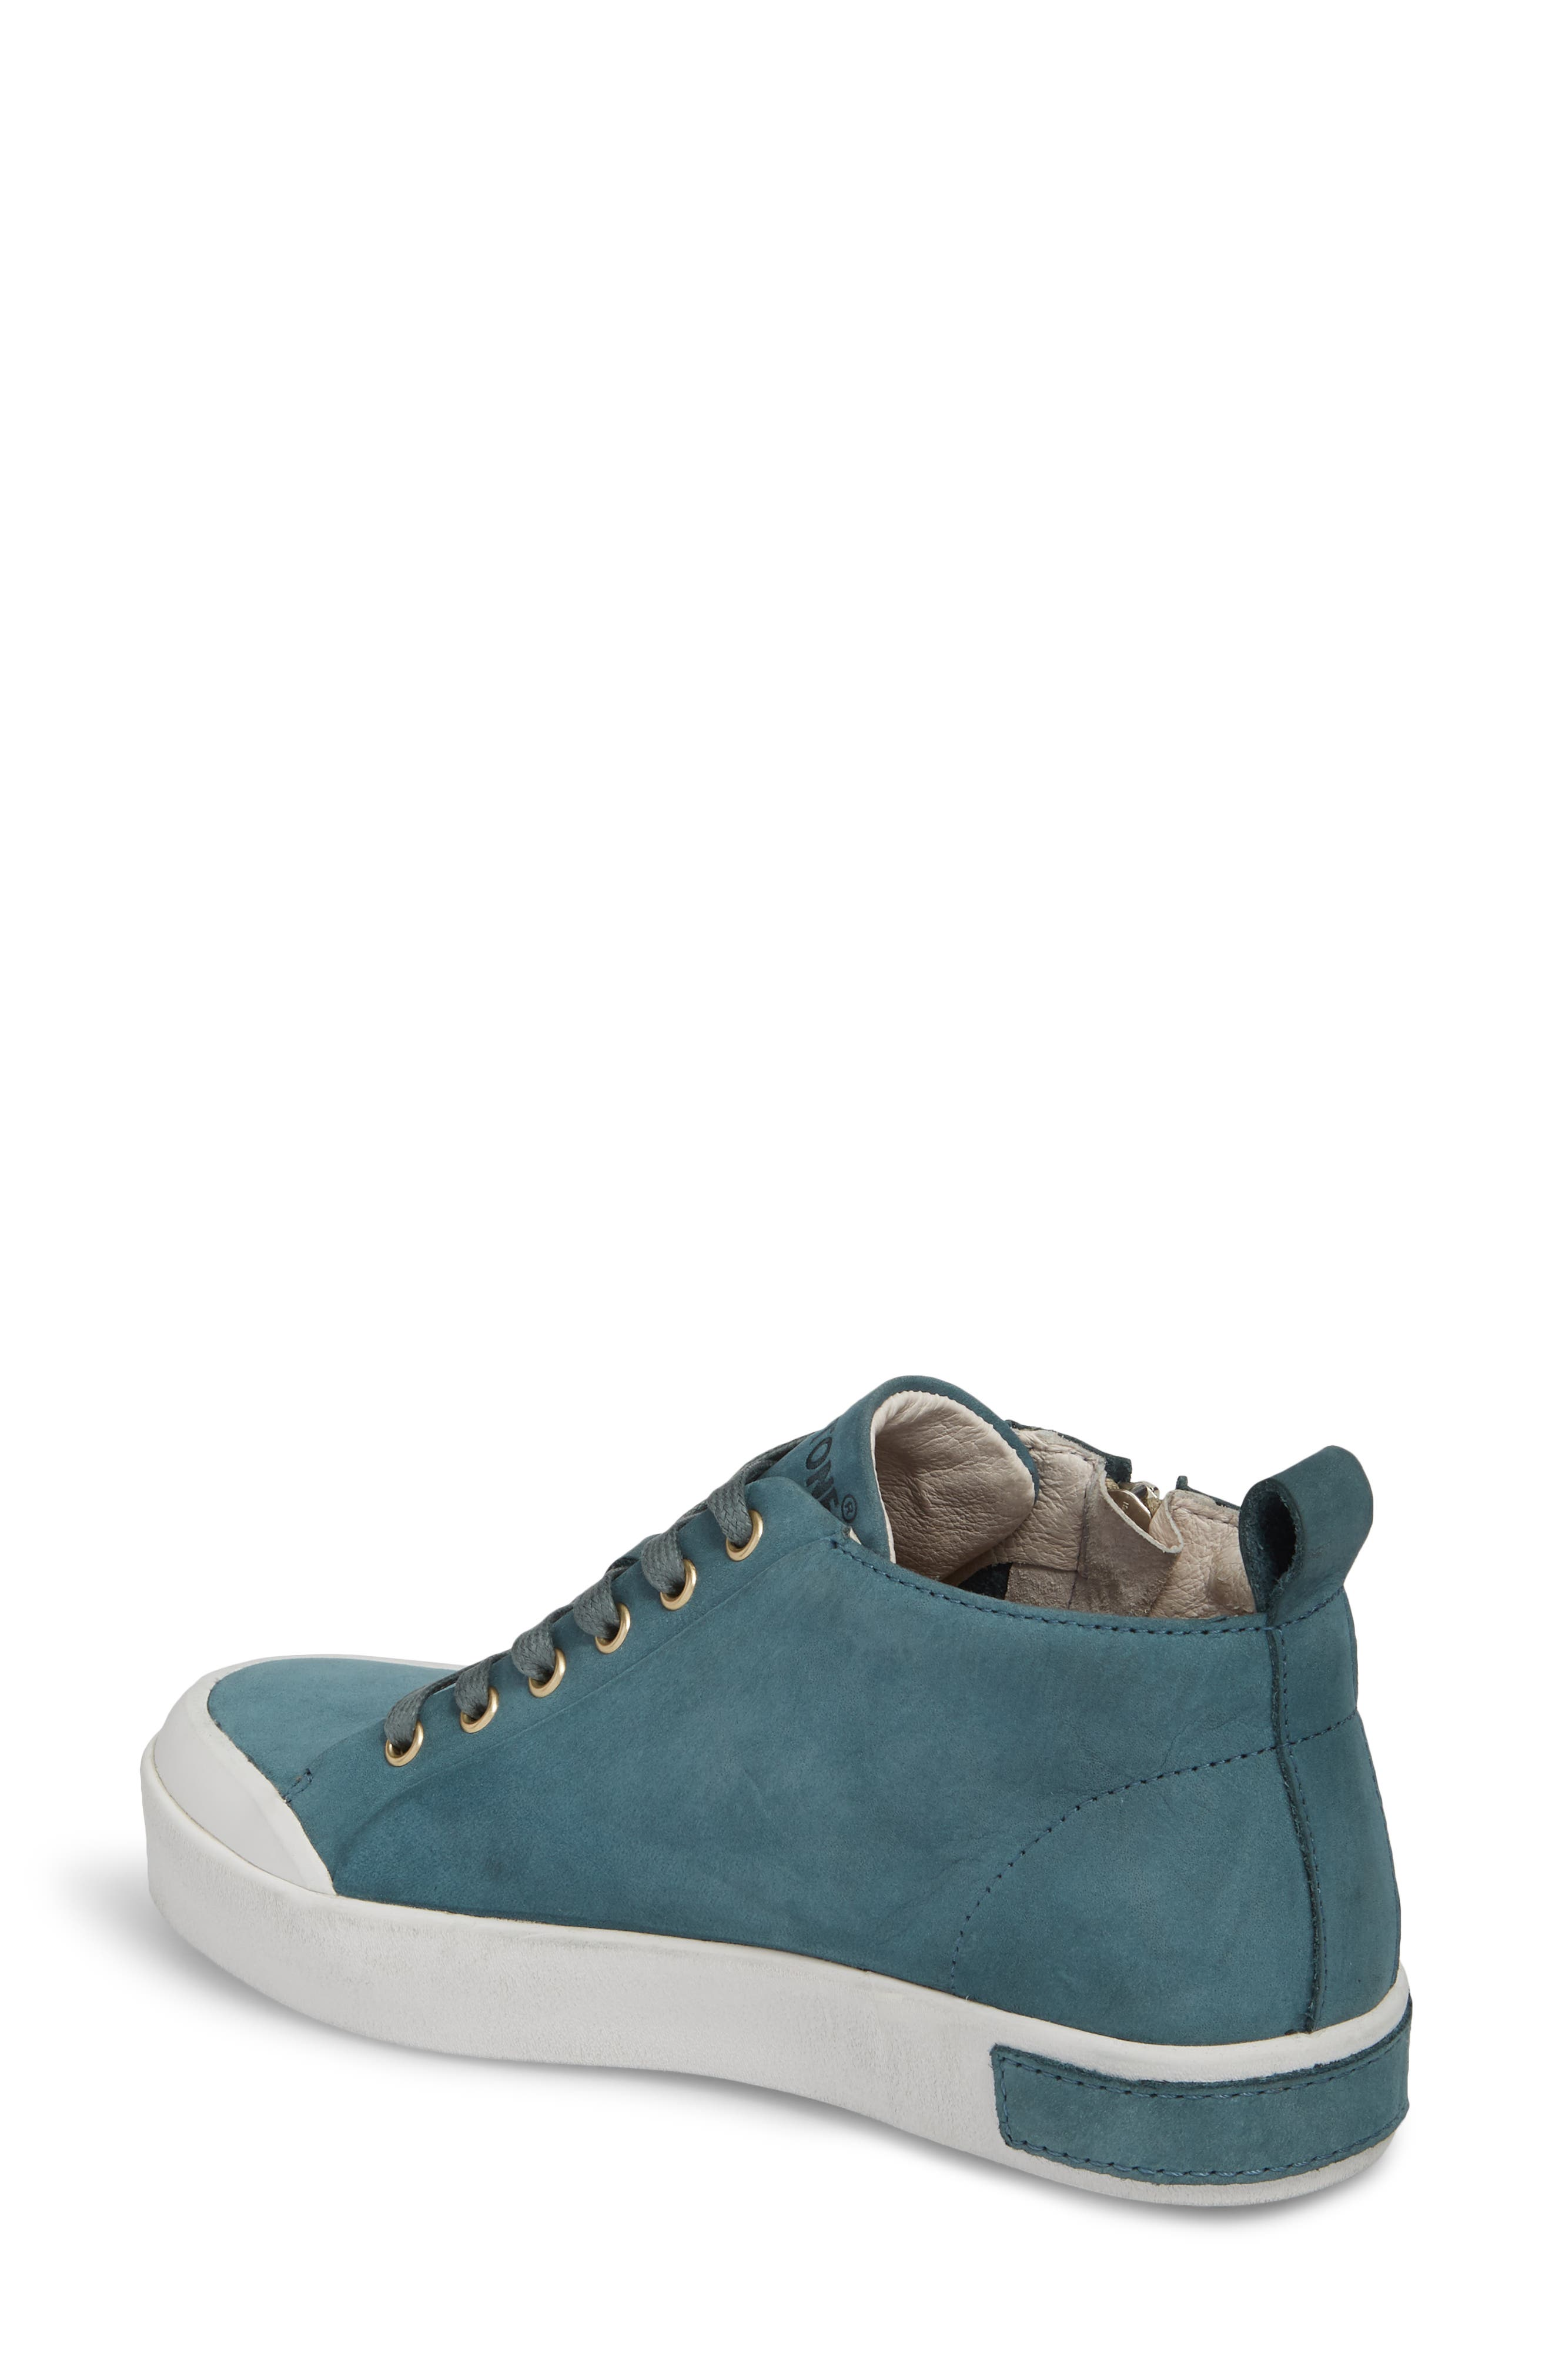 PL83 Mid Rise Sneaker,                             Alternate thumbnail 2, color,                             Mallard Blue Leather